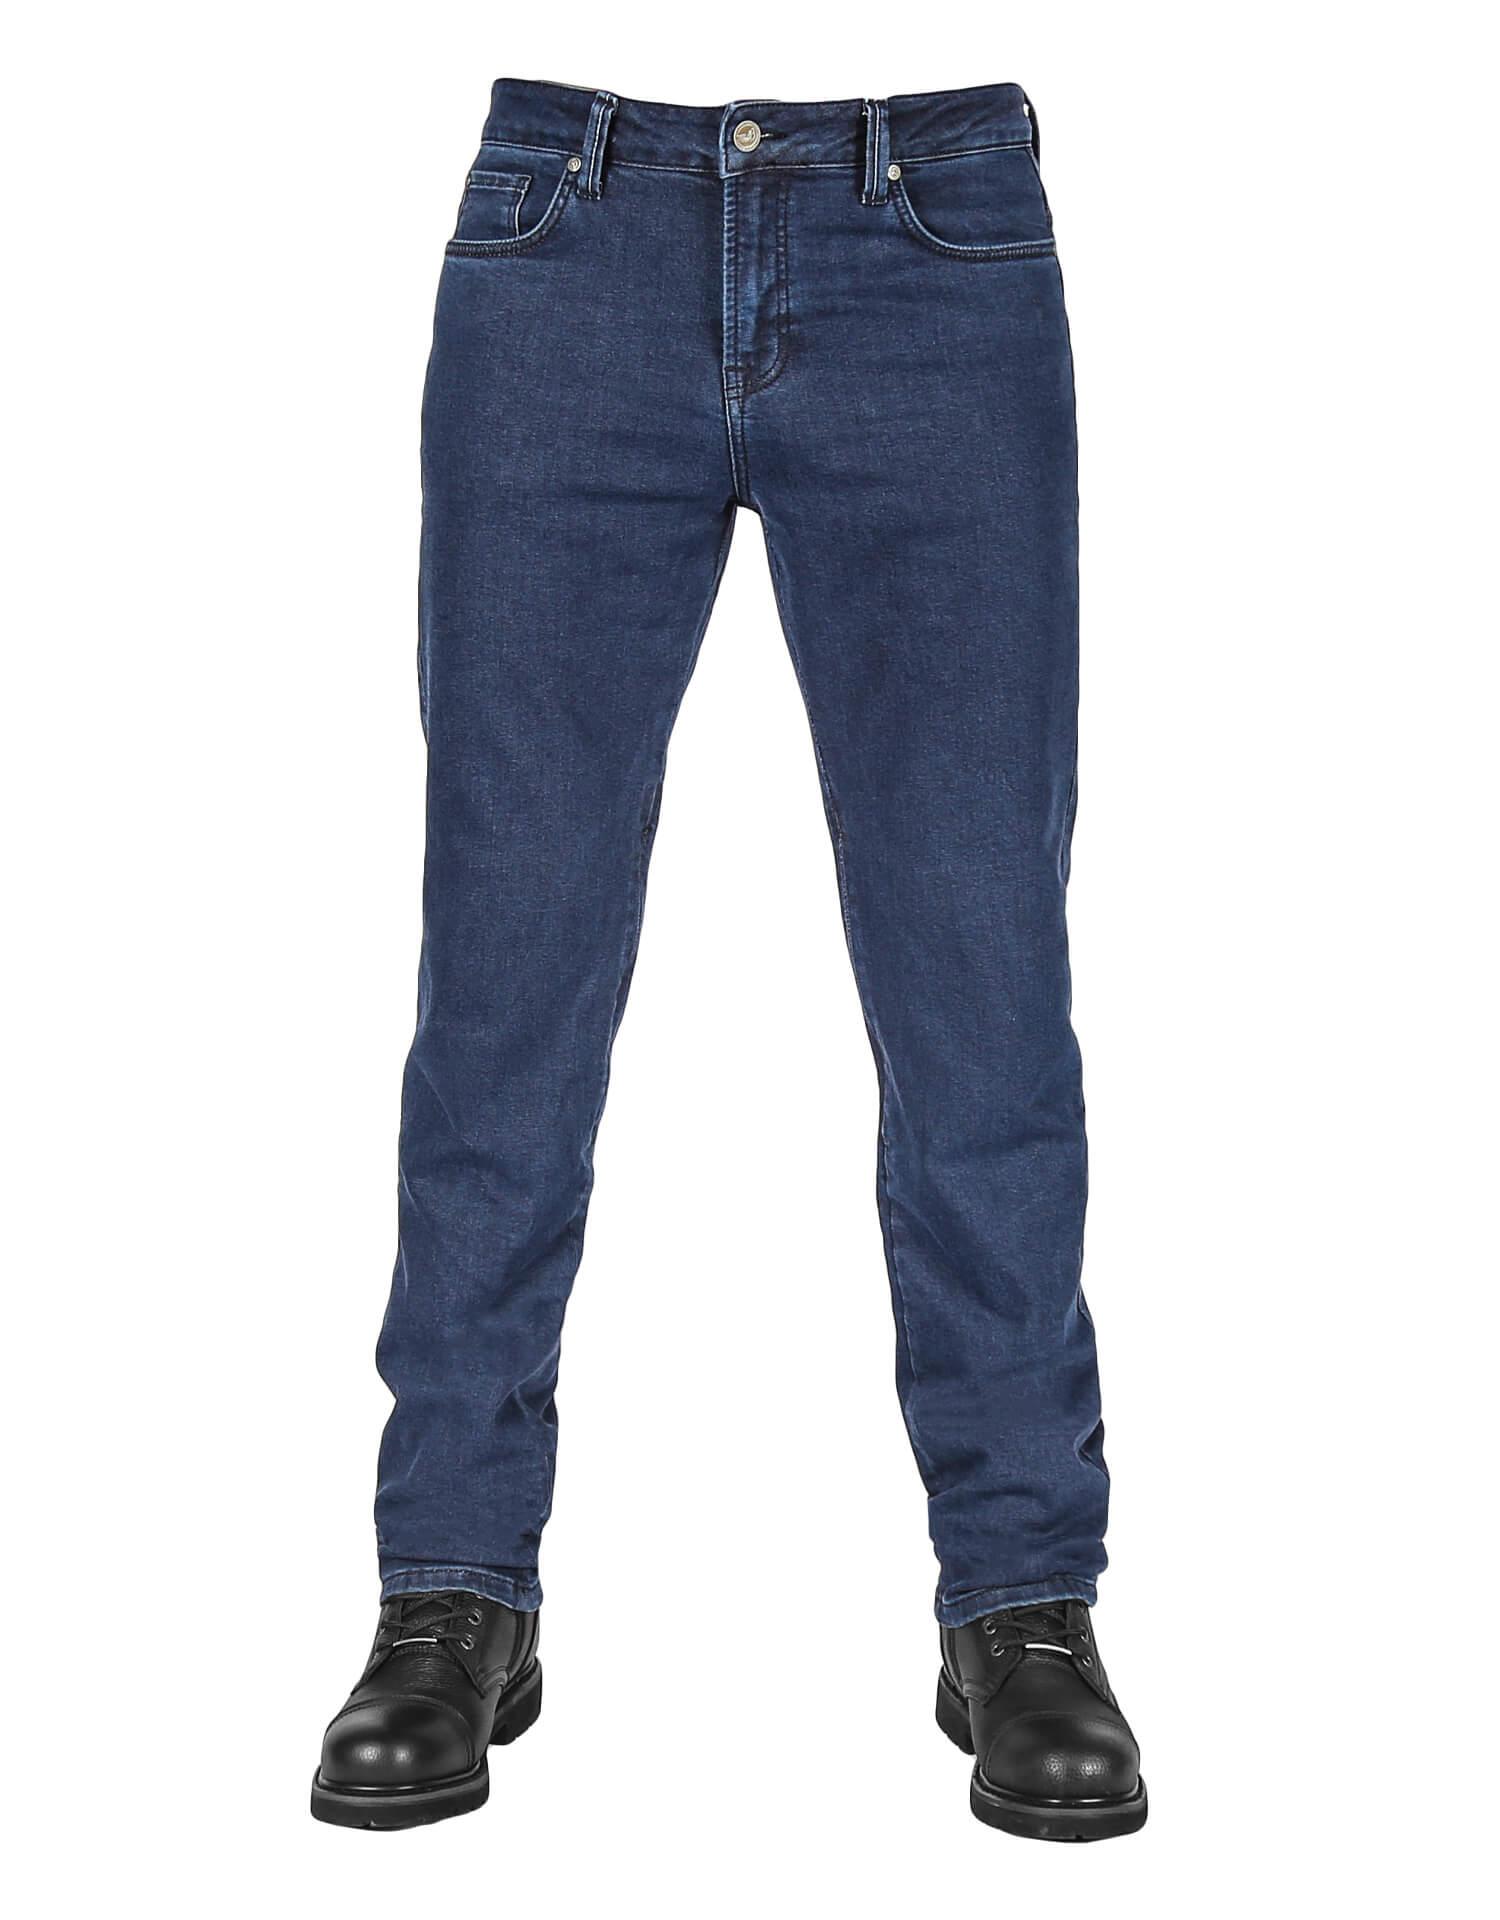 Urbanizer Dark Blue Cordura® Korumalı Motosiklet Kot Pantolonu